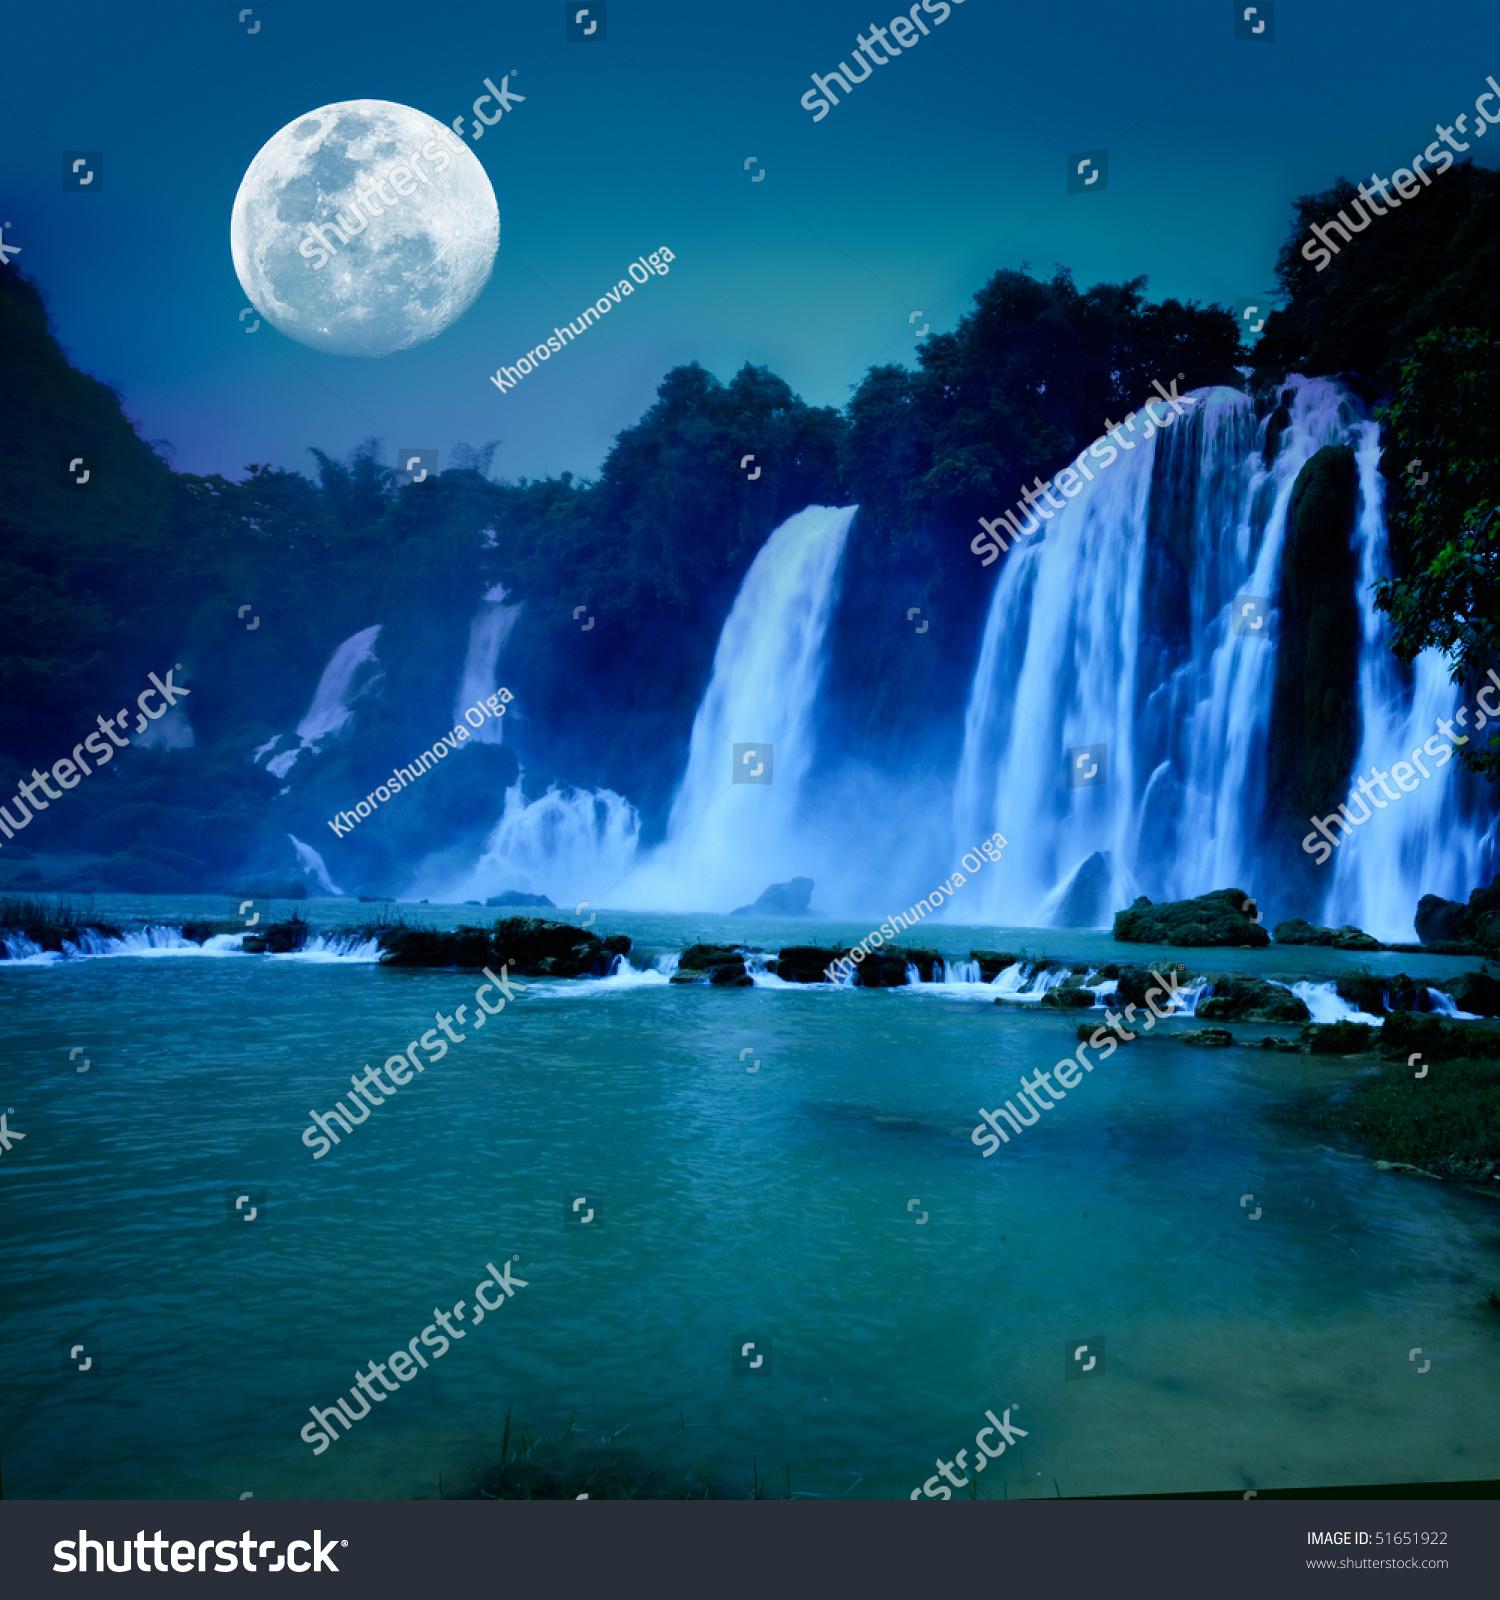 Beautiful Waterfall Under Moonlight Night Time Stock Photo 51651922 Shutterstock